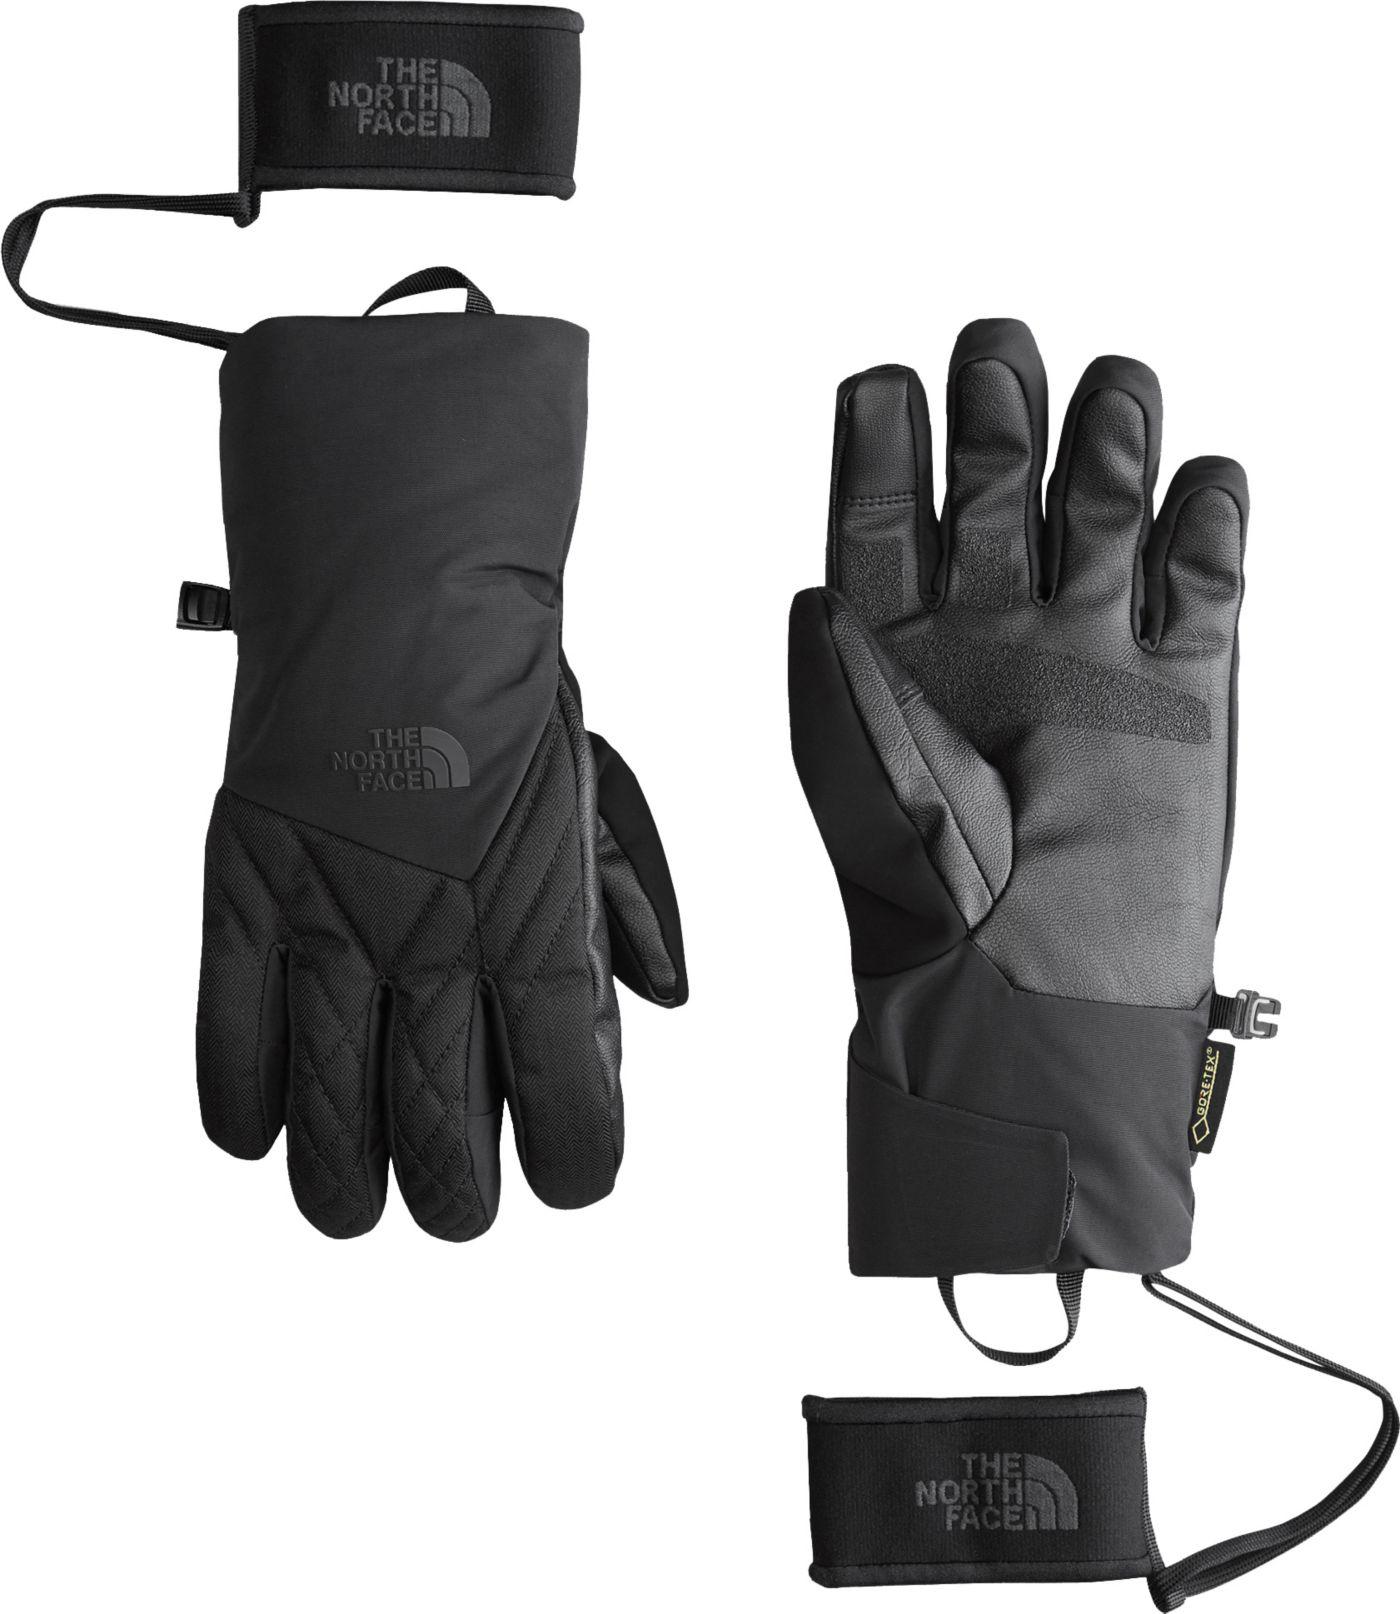 The North Face Women's Montana GORE-TEX SG Gloves